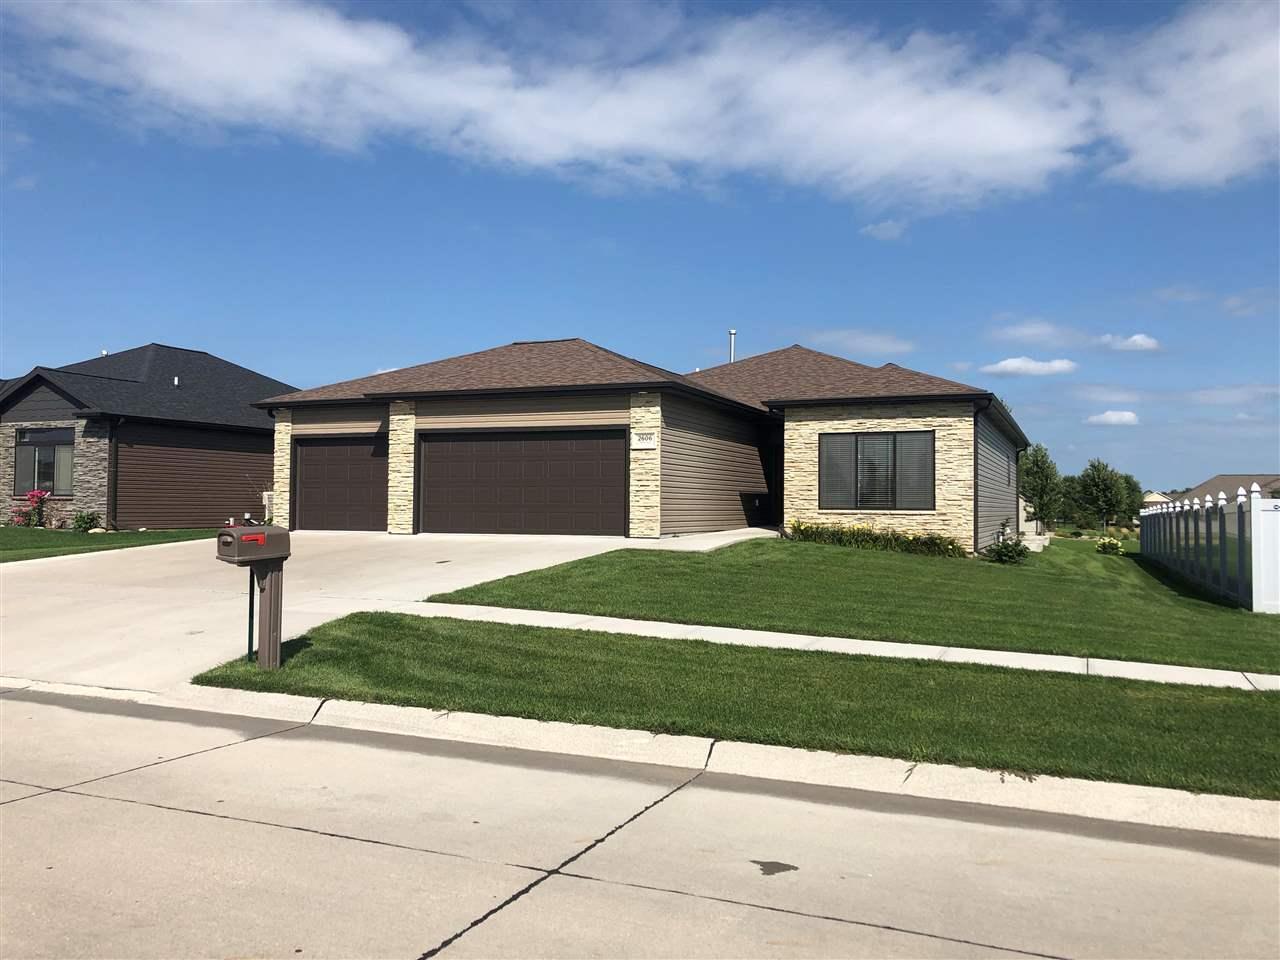 2606 Merle, Hastings, Nebraska